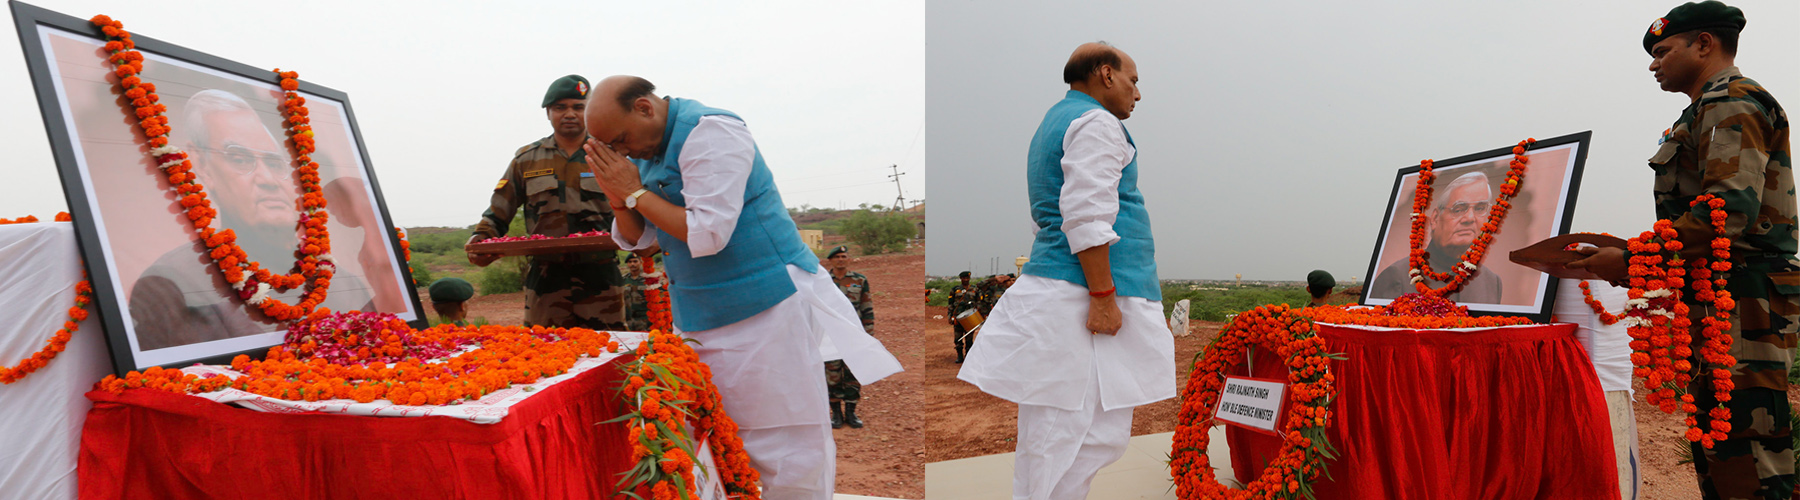 Raksha Mantri Shri Rajnath Singh paying homage at Pokhran to former Prime Minister Shri Atal Behari Vajpayee on his first death anniversary on Friday, August 16, 2019. India had conducted nuclear tests in 1998 at Pokhran under the leadership of Shri Vajpa